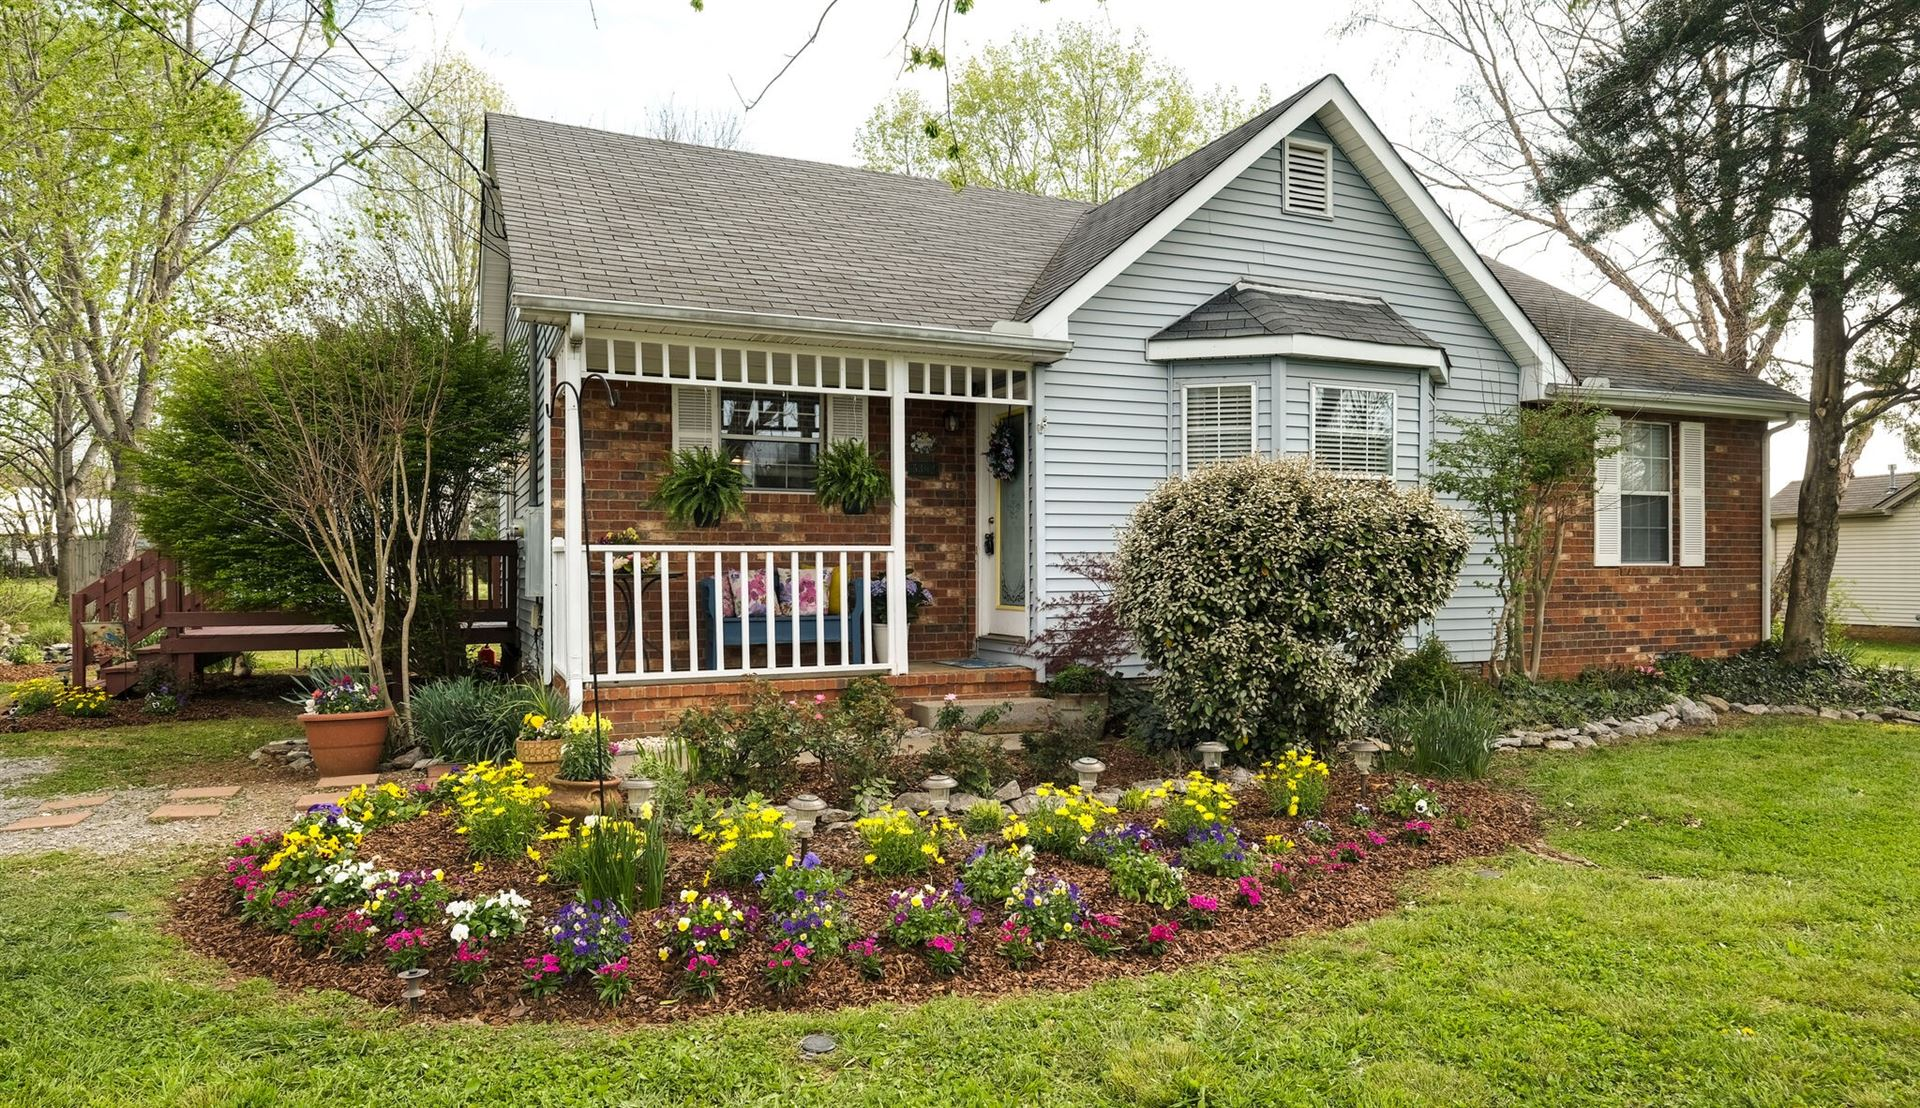 5302 Grassland Dr, Murfreesboro, TN 37129 - MLS#: 2242320